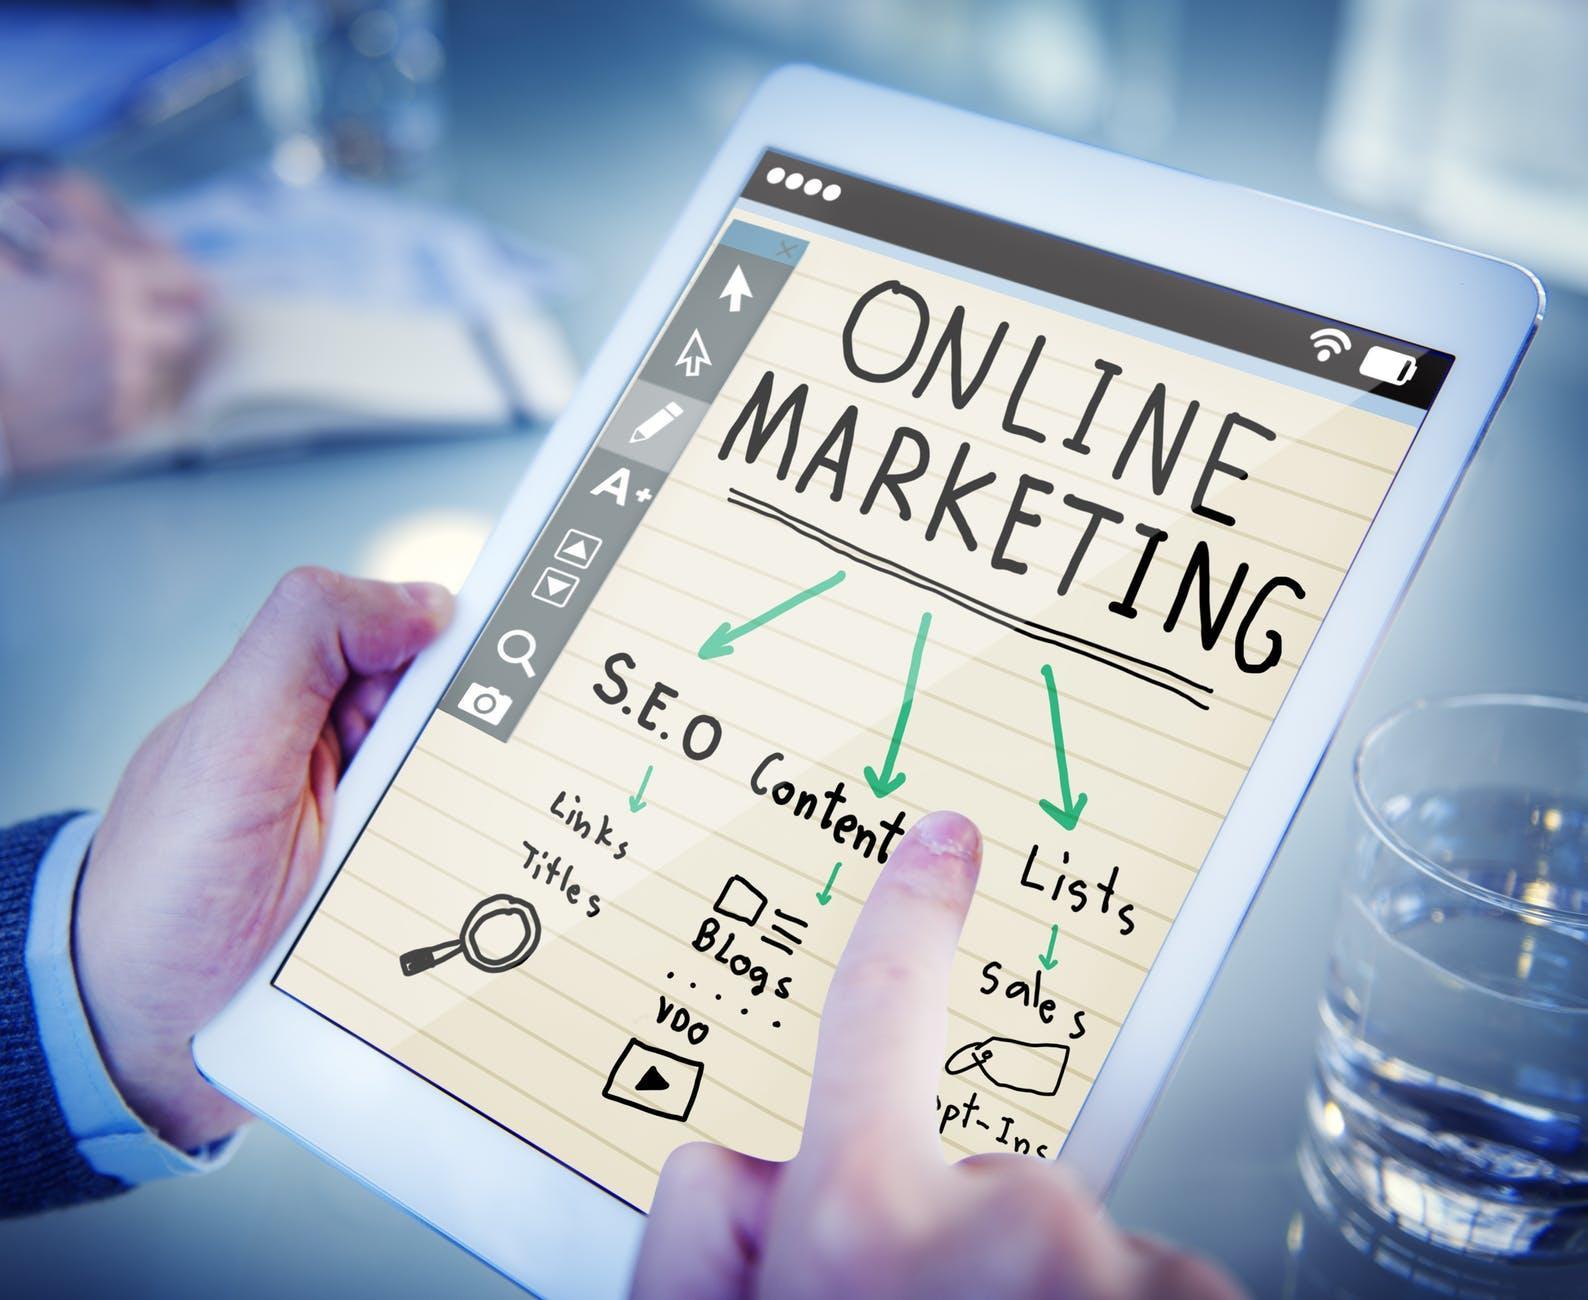 C:\Users\Tuba1\Desktop\Downloads\7-high-paid-digital-marketing-jobs-intro.jpeg